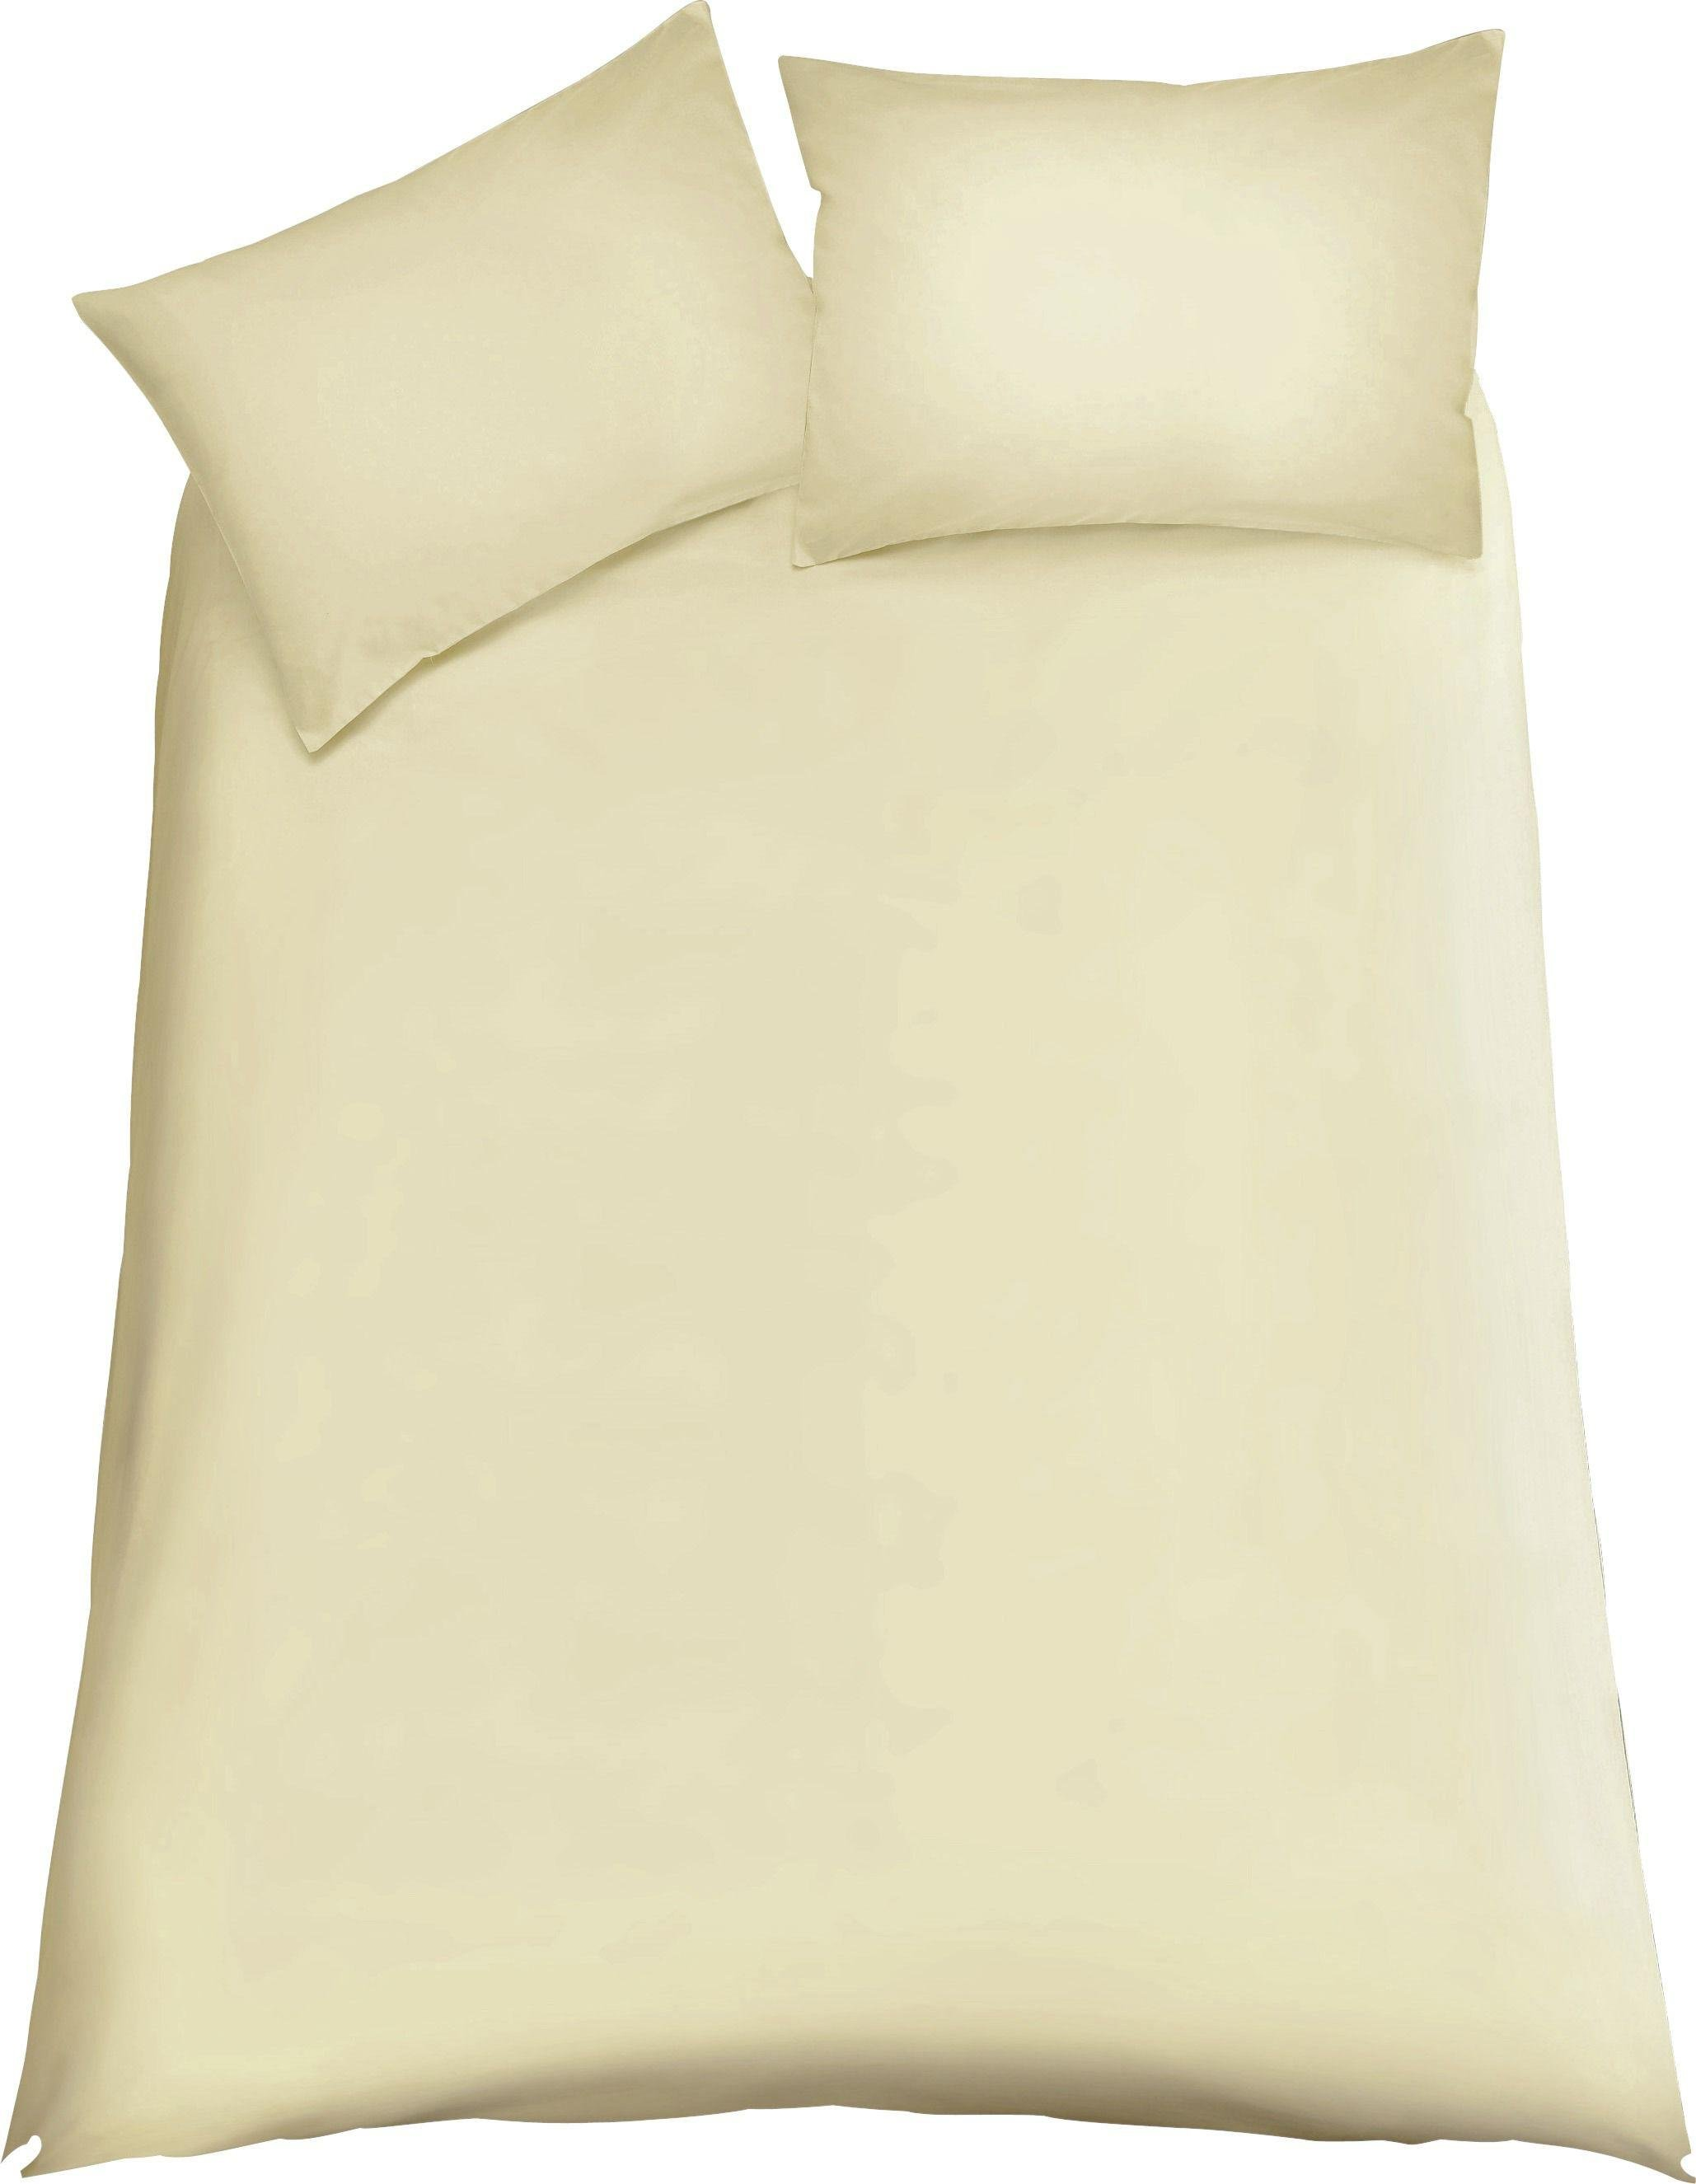 ColourMatch - Cotton Cream - Bedding Set - Double